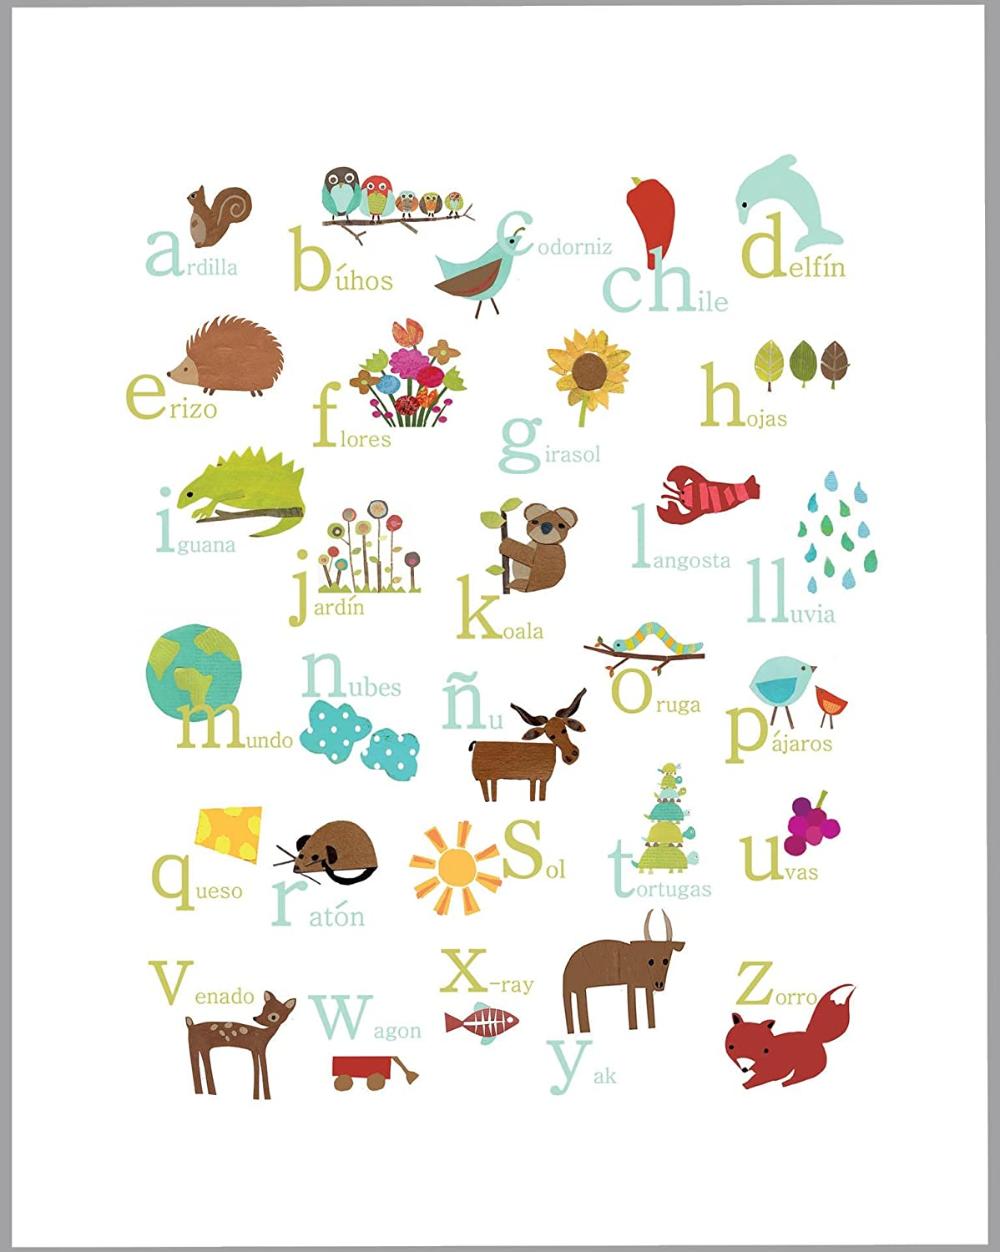 Spanish Alphabet Posters Google Search Spanish Alphabet Alphabet Poster Alphabet Wall Art [ 1252 x 1000 Pixel ]